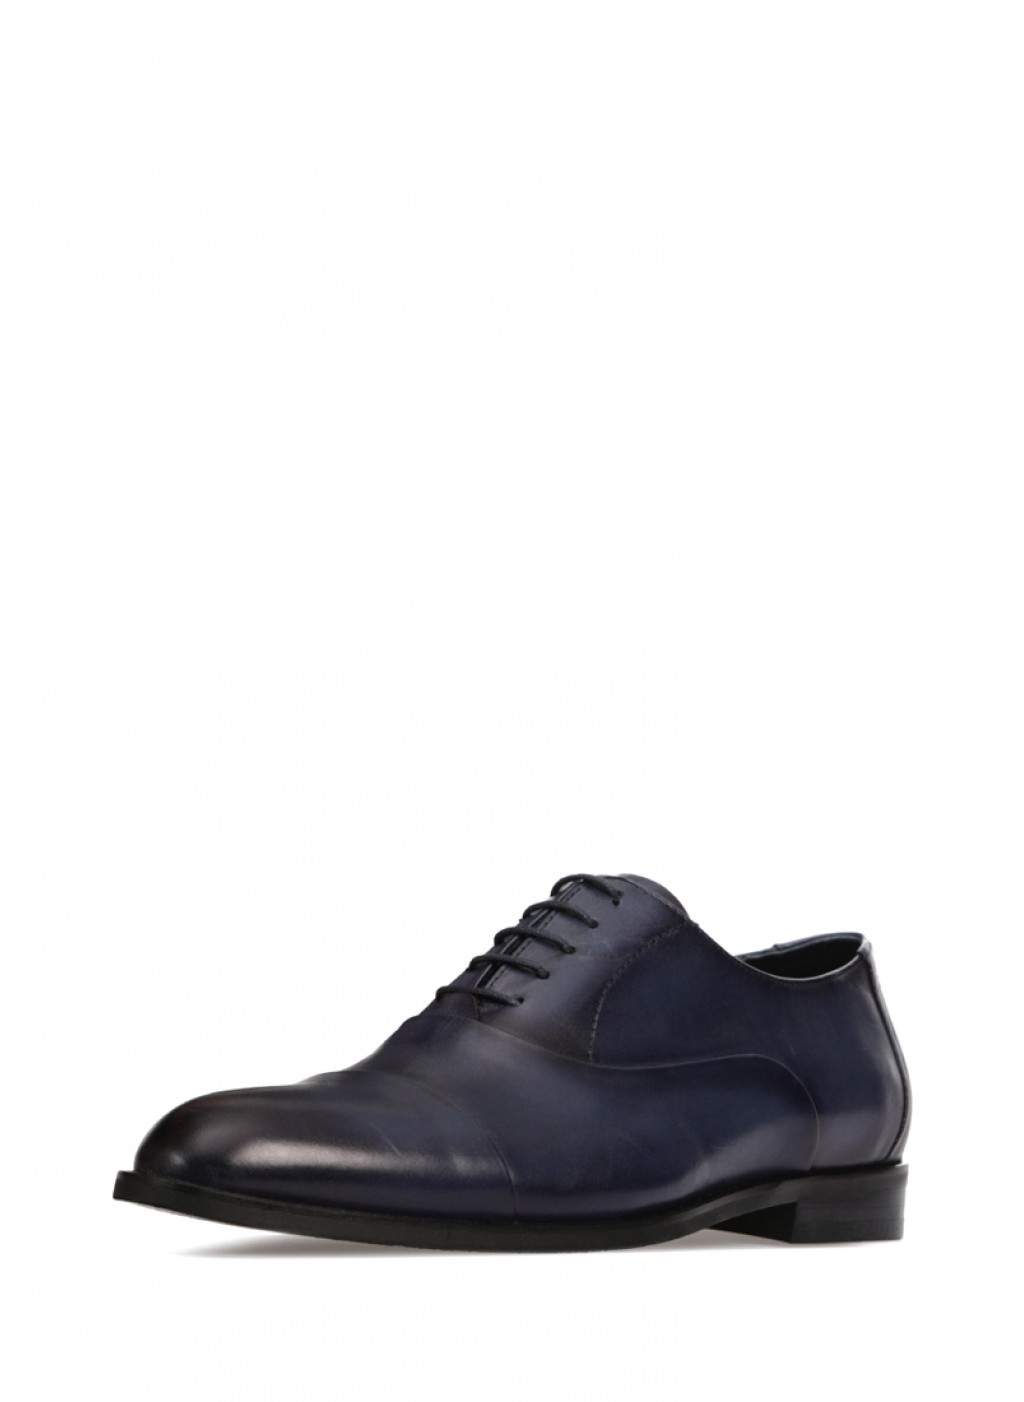 Обувь NAVI NV92-BX-157201